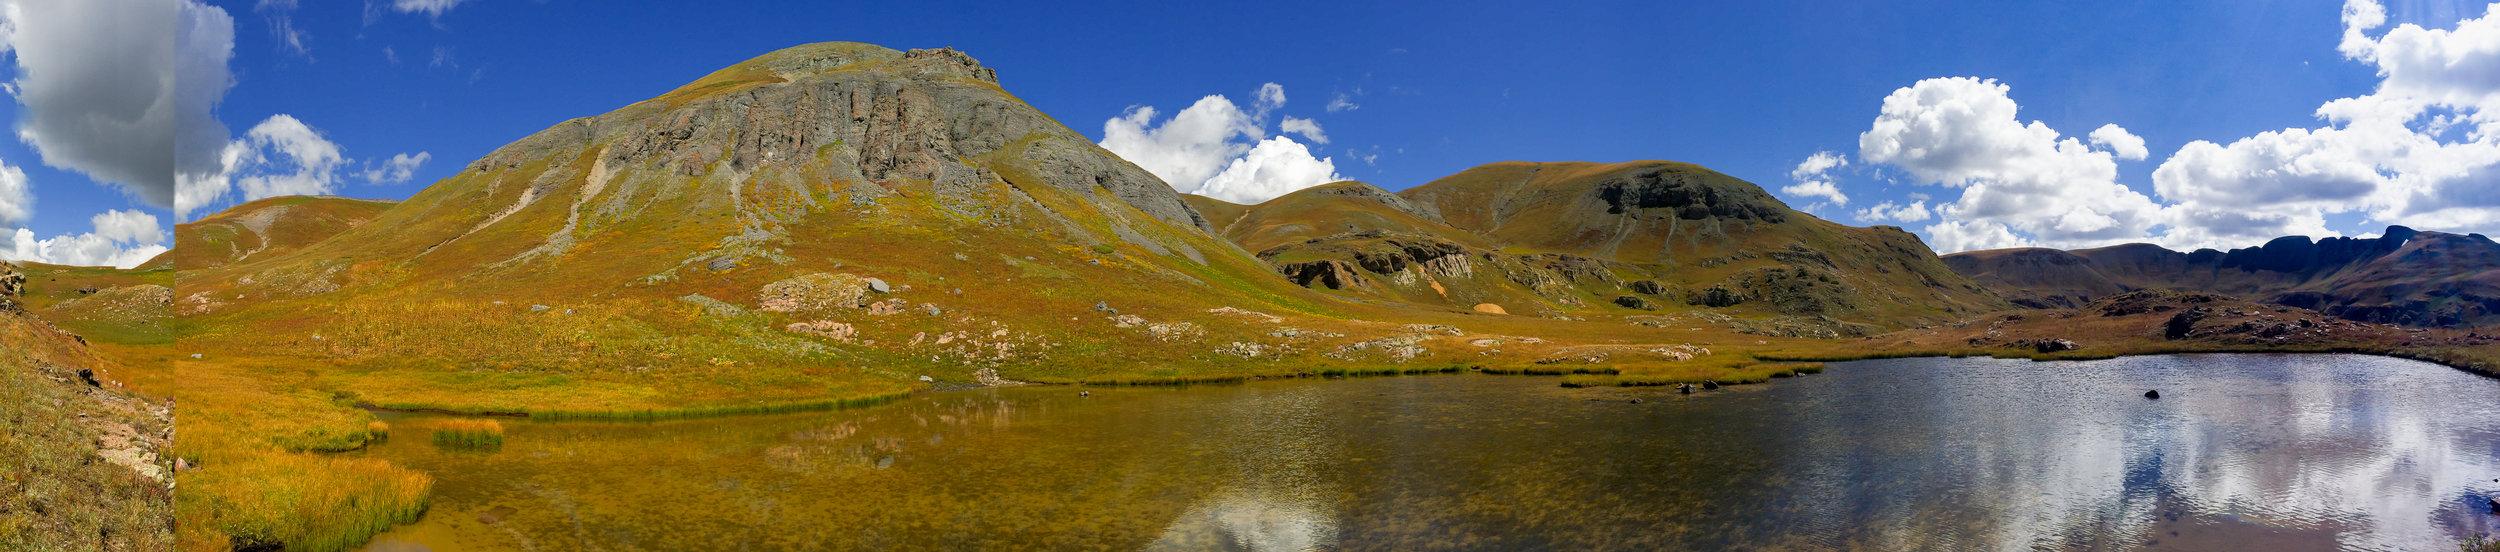 Little Pond below Whitehead Peak